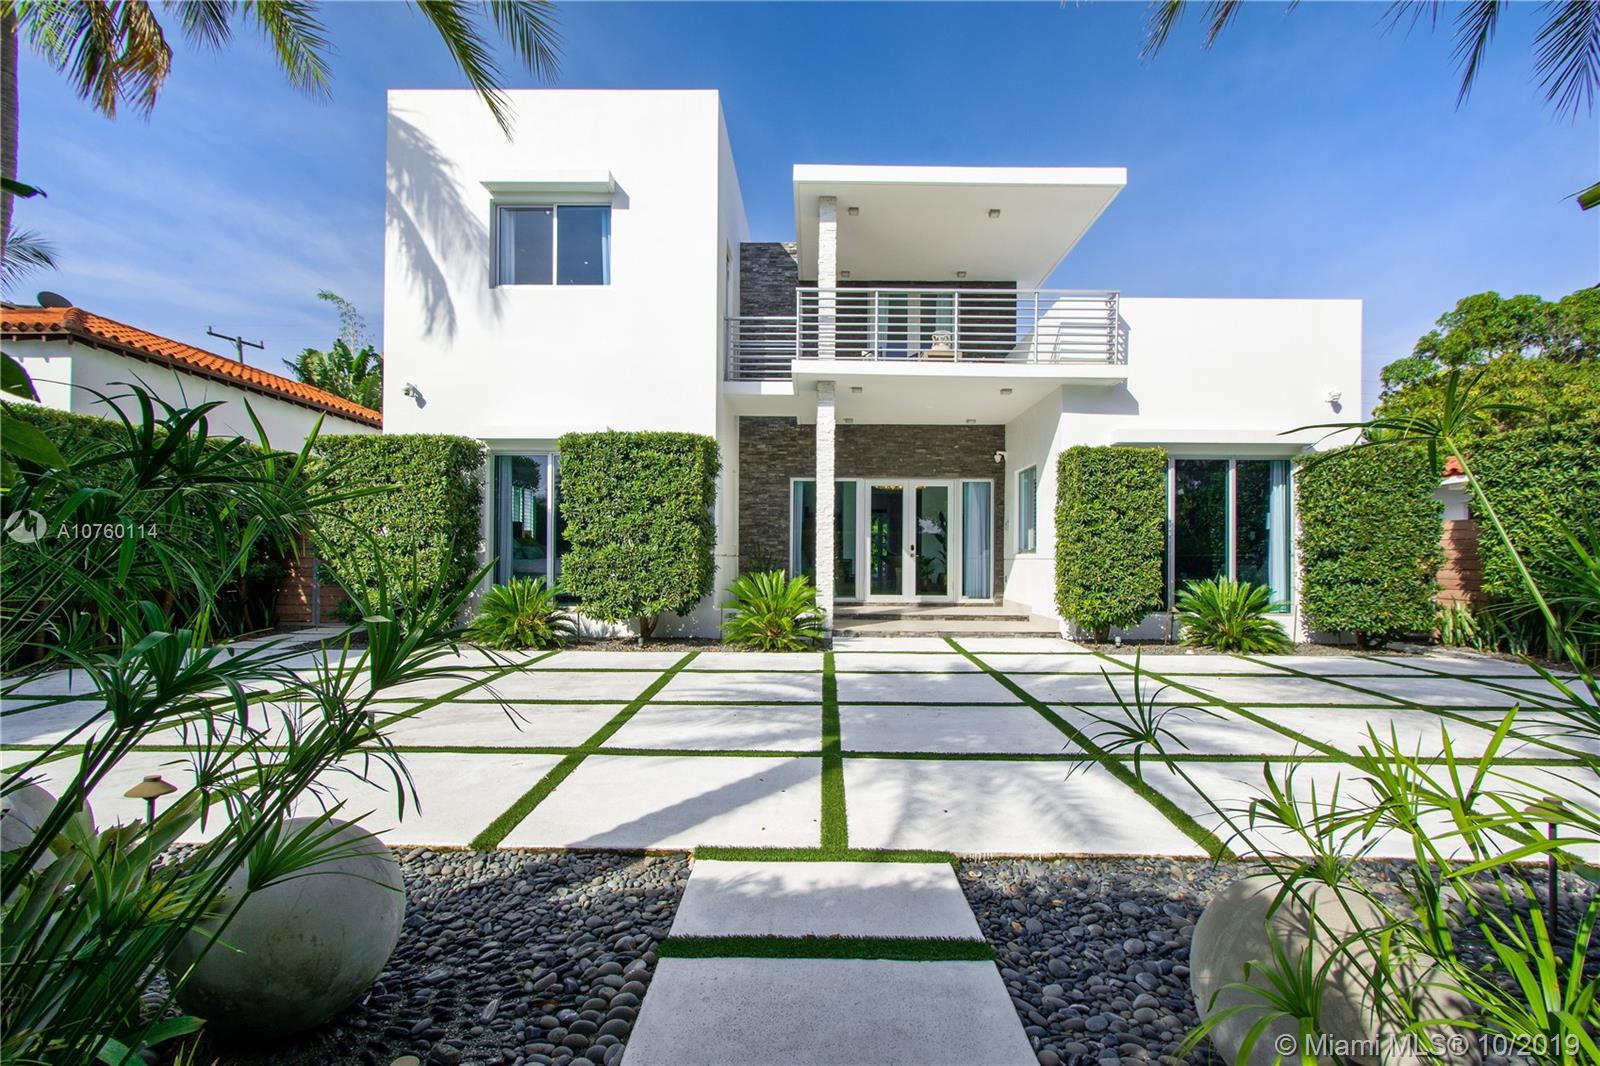 2382 Alton Rd, Miami Beach FL 33140